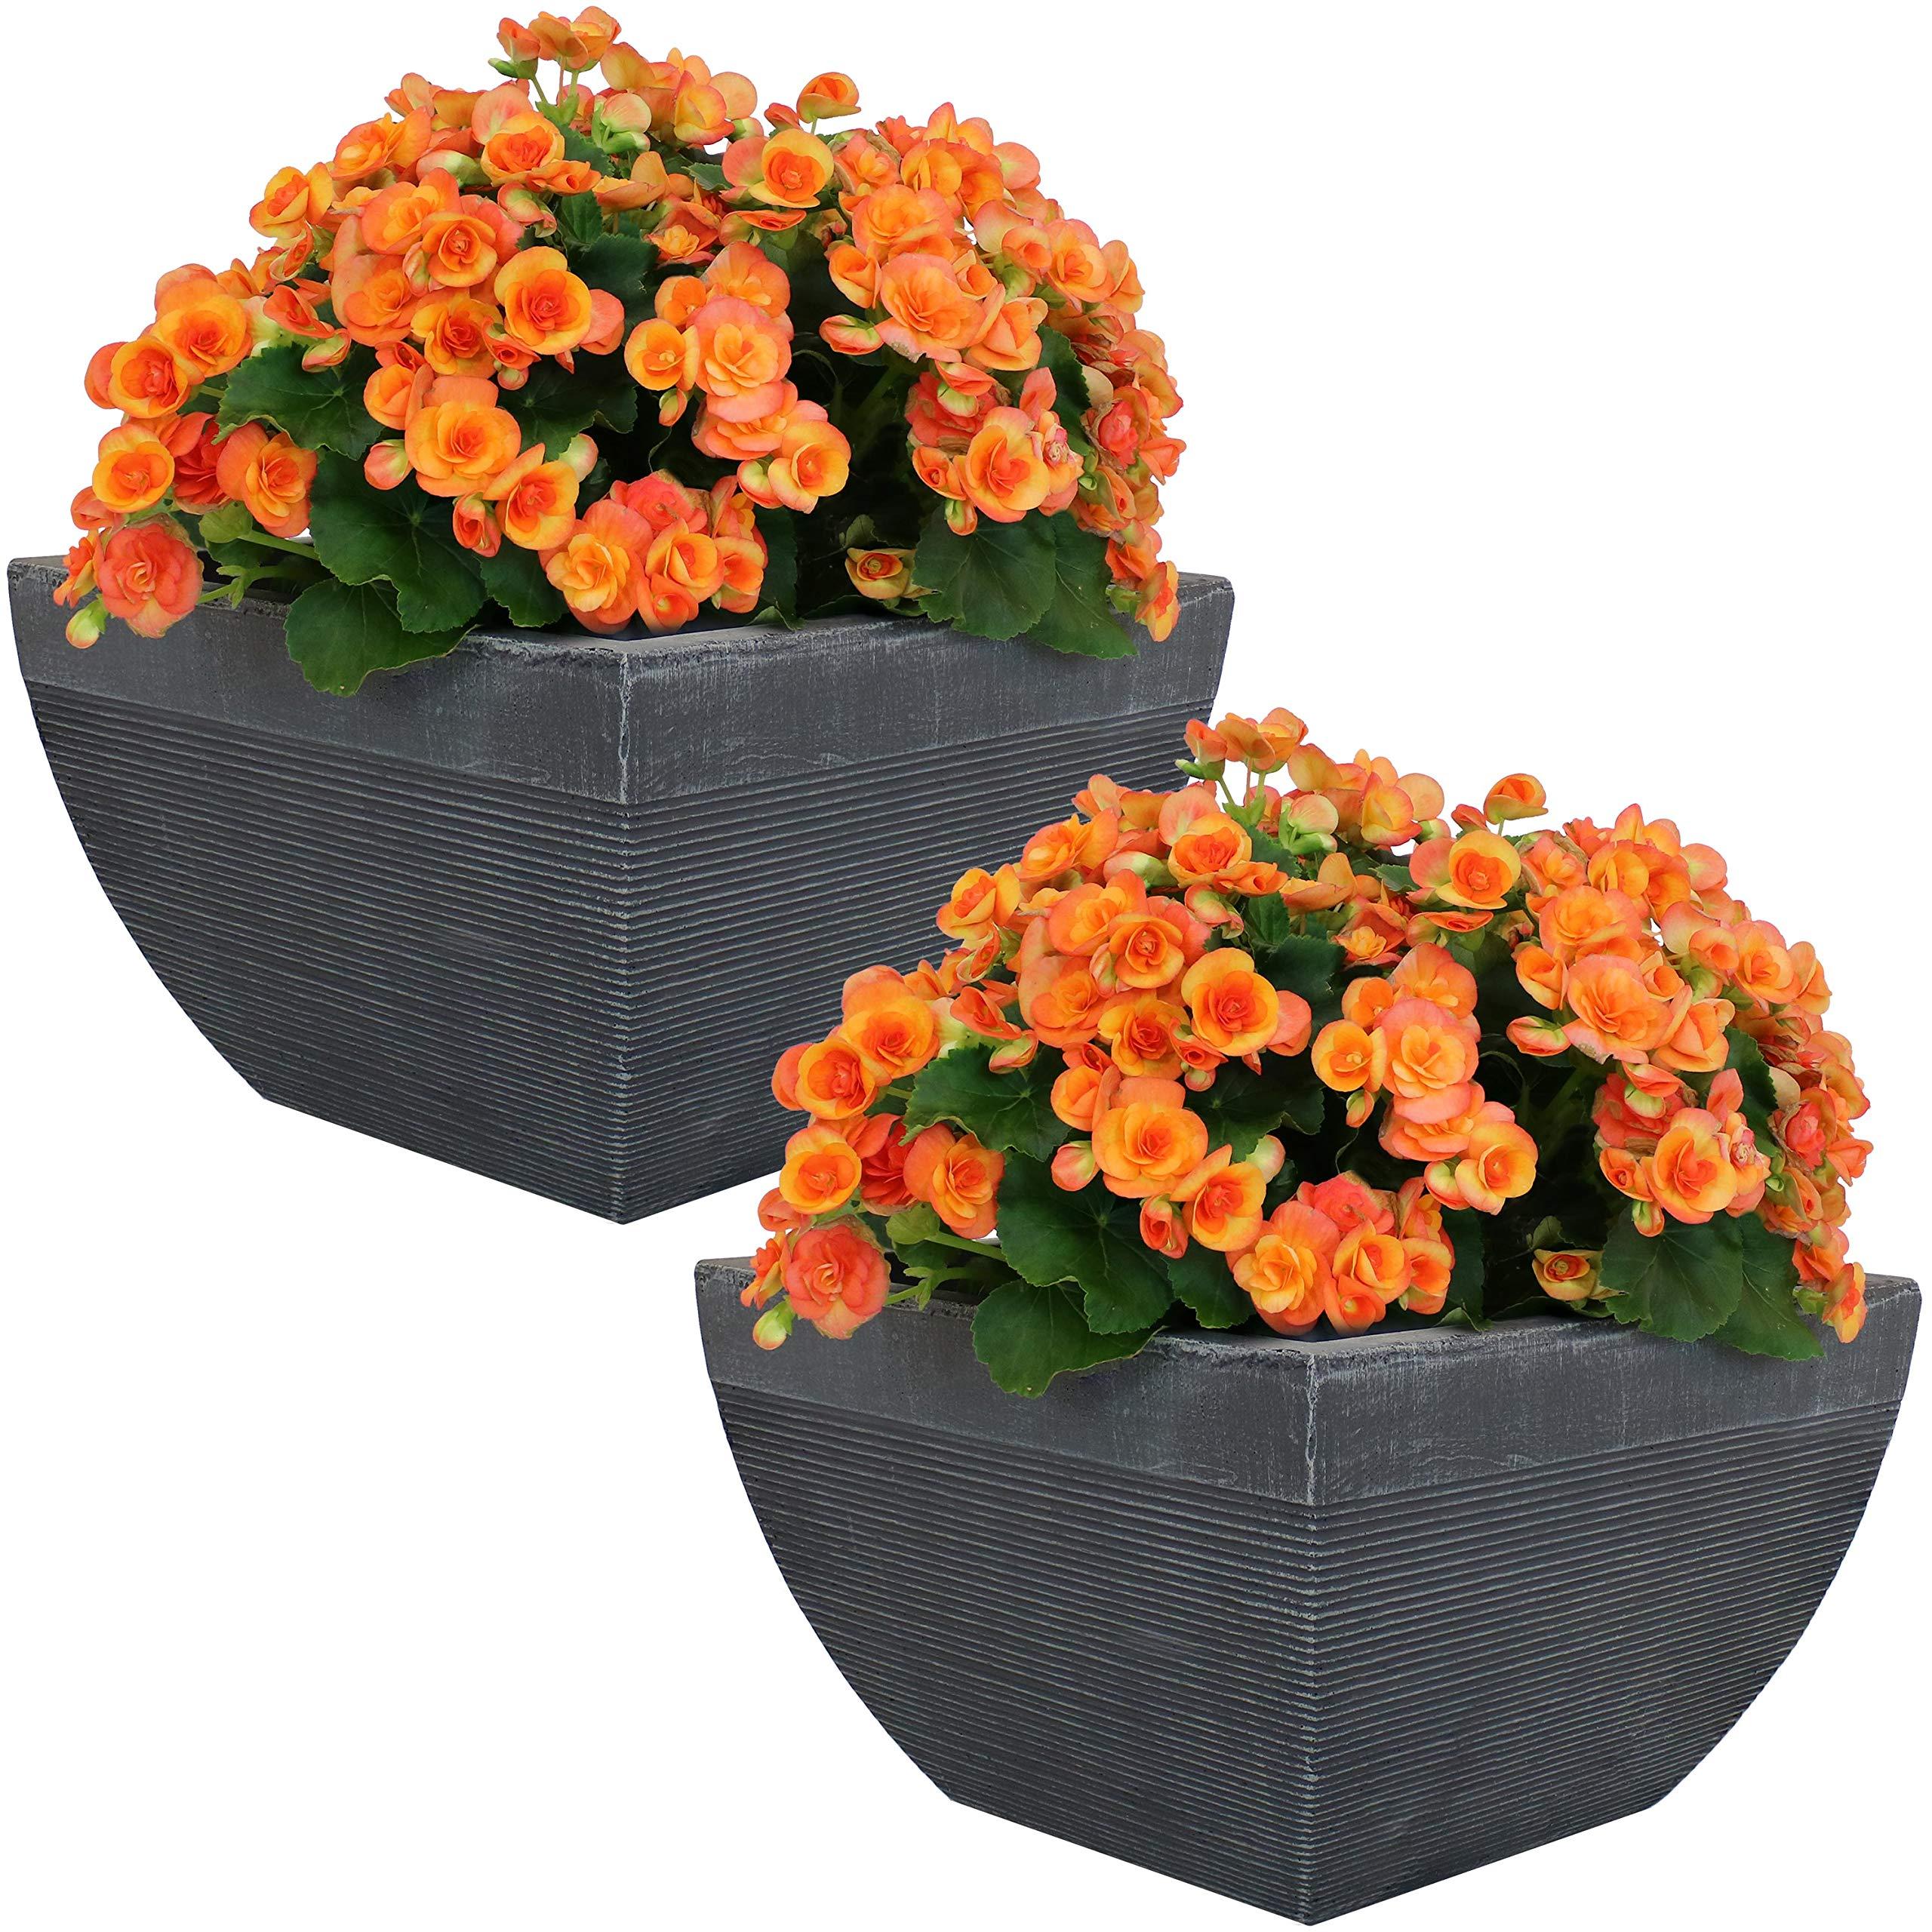 Sunnydaze Residency Fiber Clay Modern Planter Flower Pot, Durable Indoor/Outdoor 14-Inch Set of 2